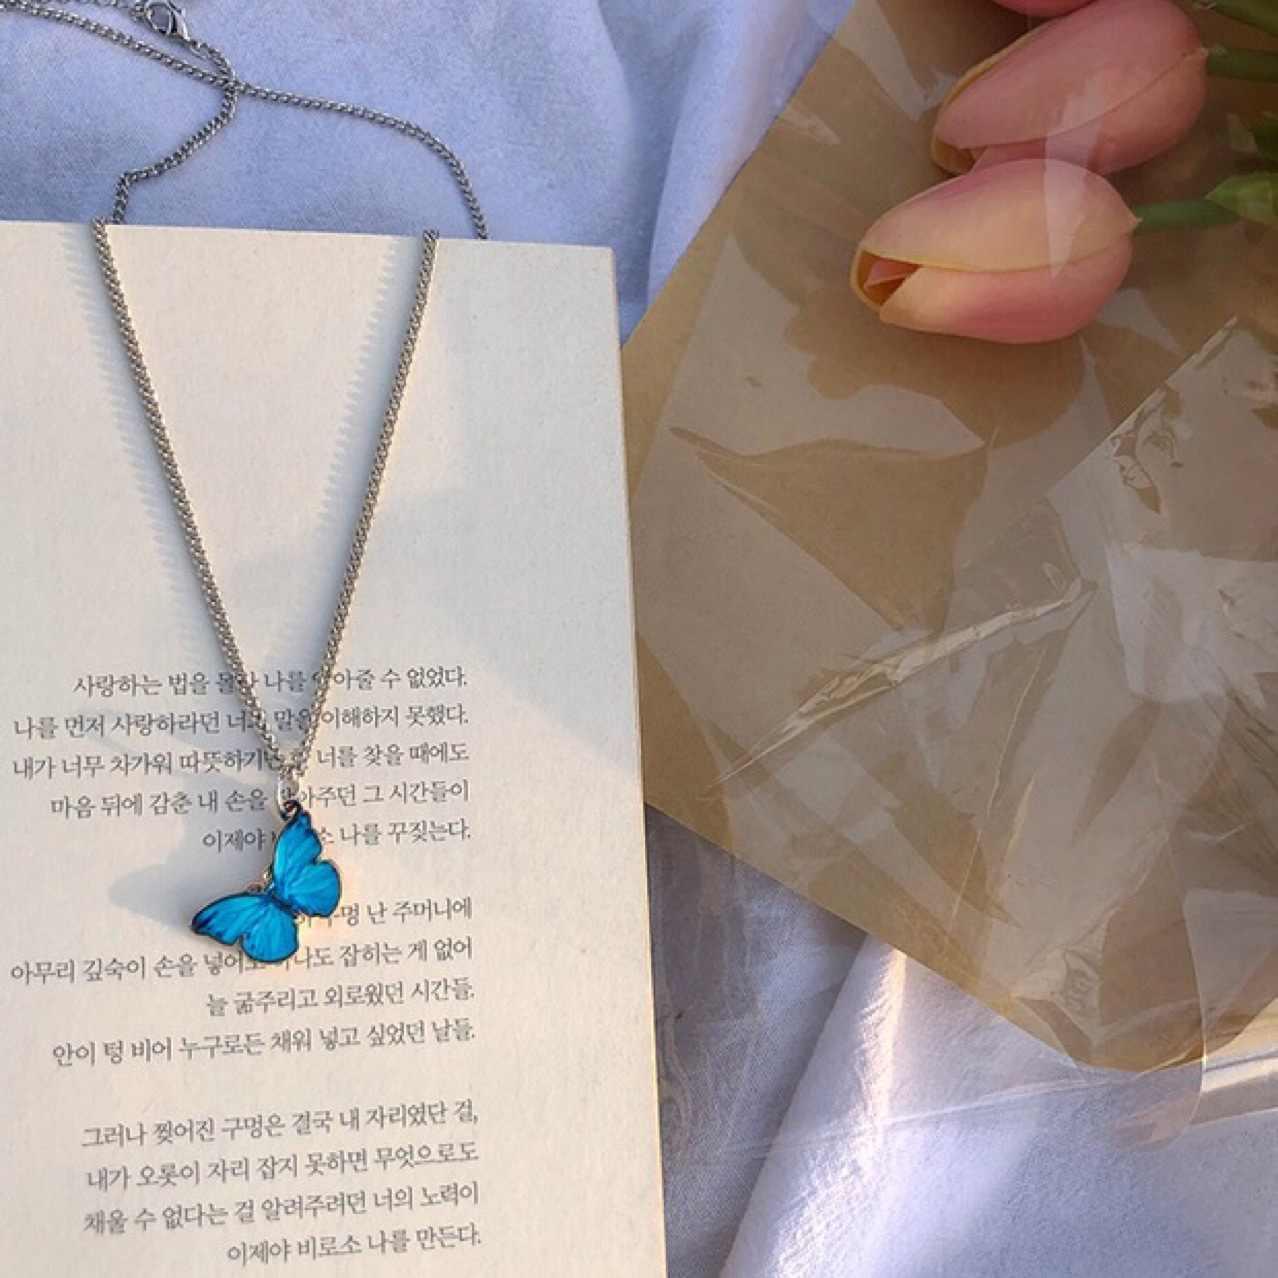 2020 Nieuwe Paars Blauwe Vlinder Hanger Ketting Voor Vrouwen Vintage Titanium Wedding Ketting Choker Sieraden Accessoires